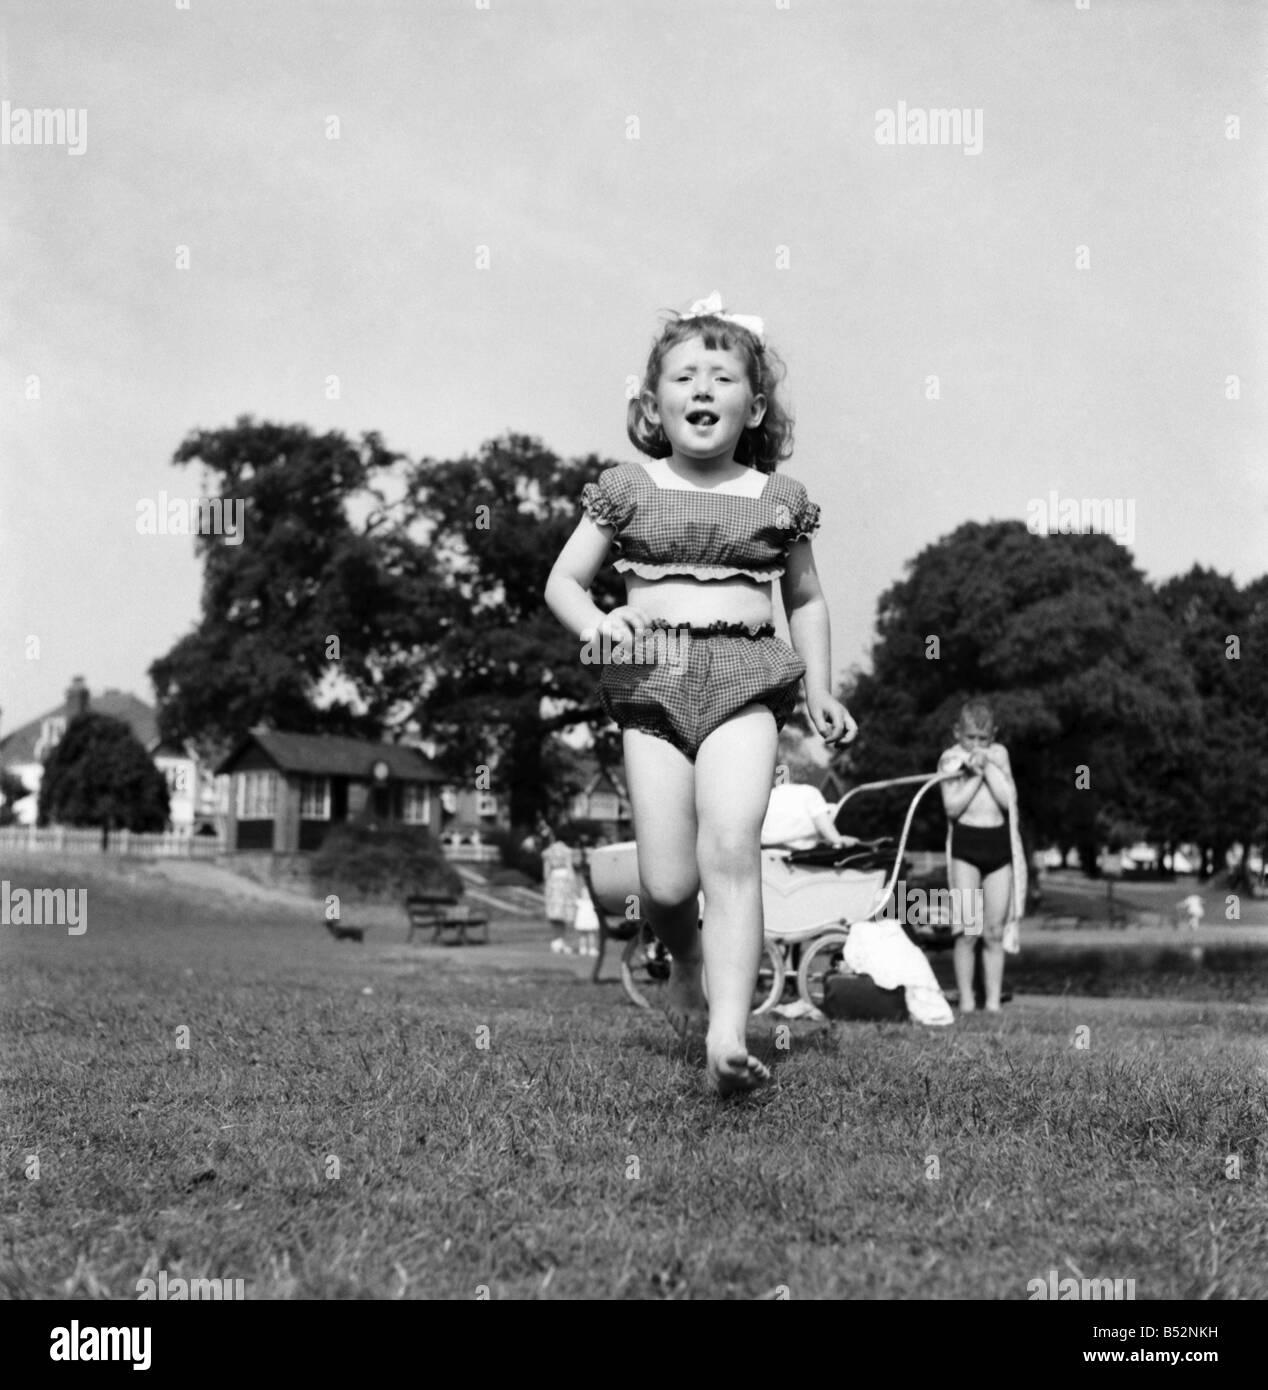 0eded2317385a Holidays, little girl modelling swimsuit. June 1953 D3299-004&